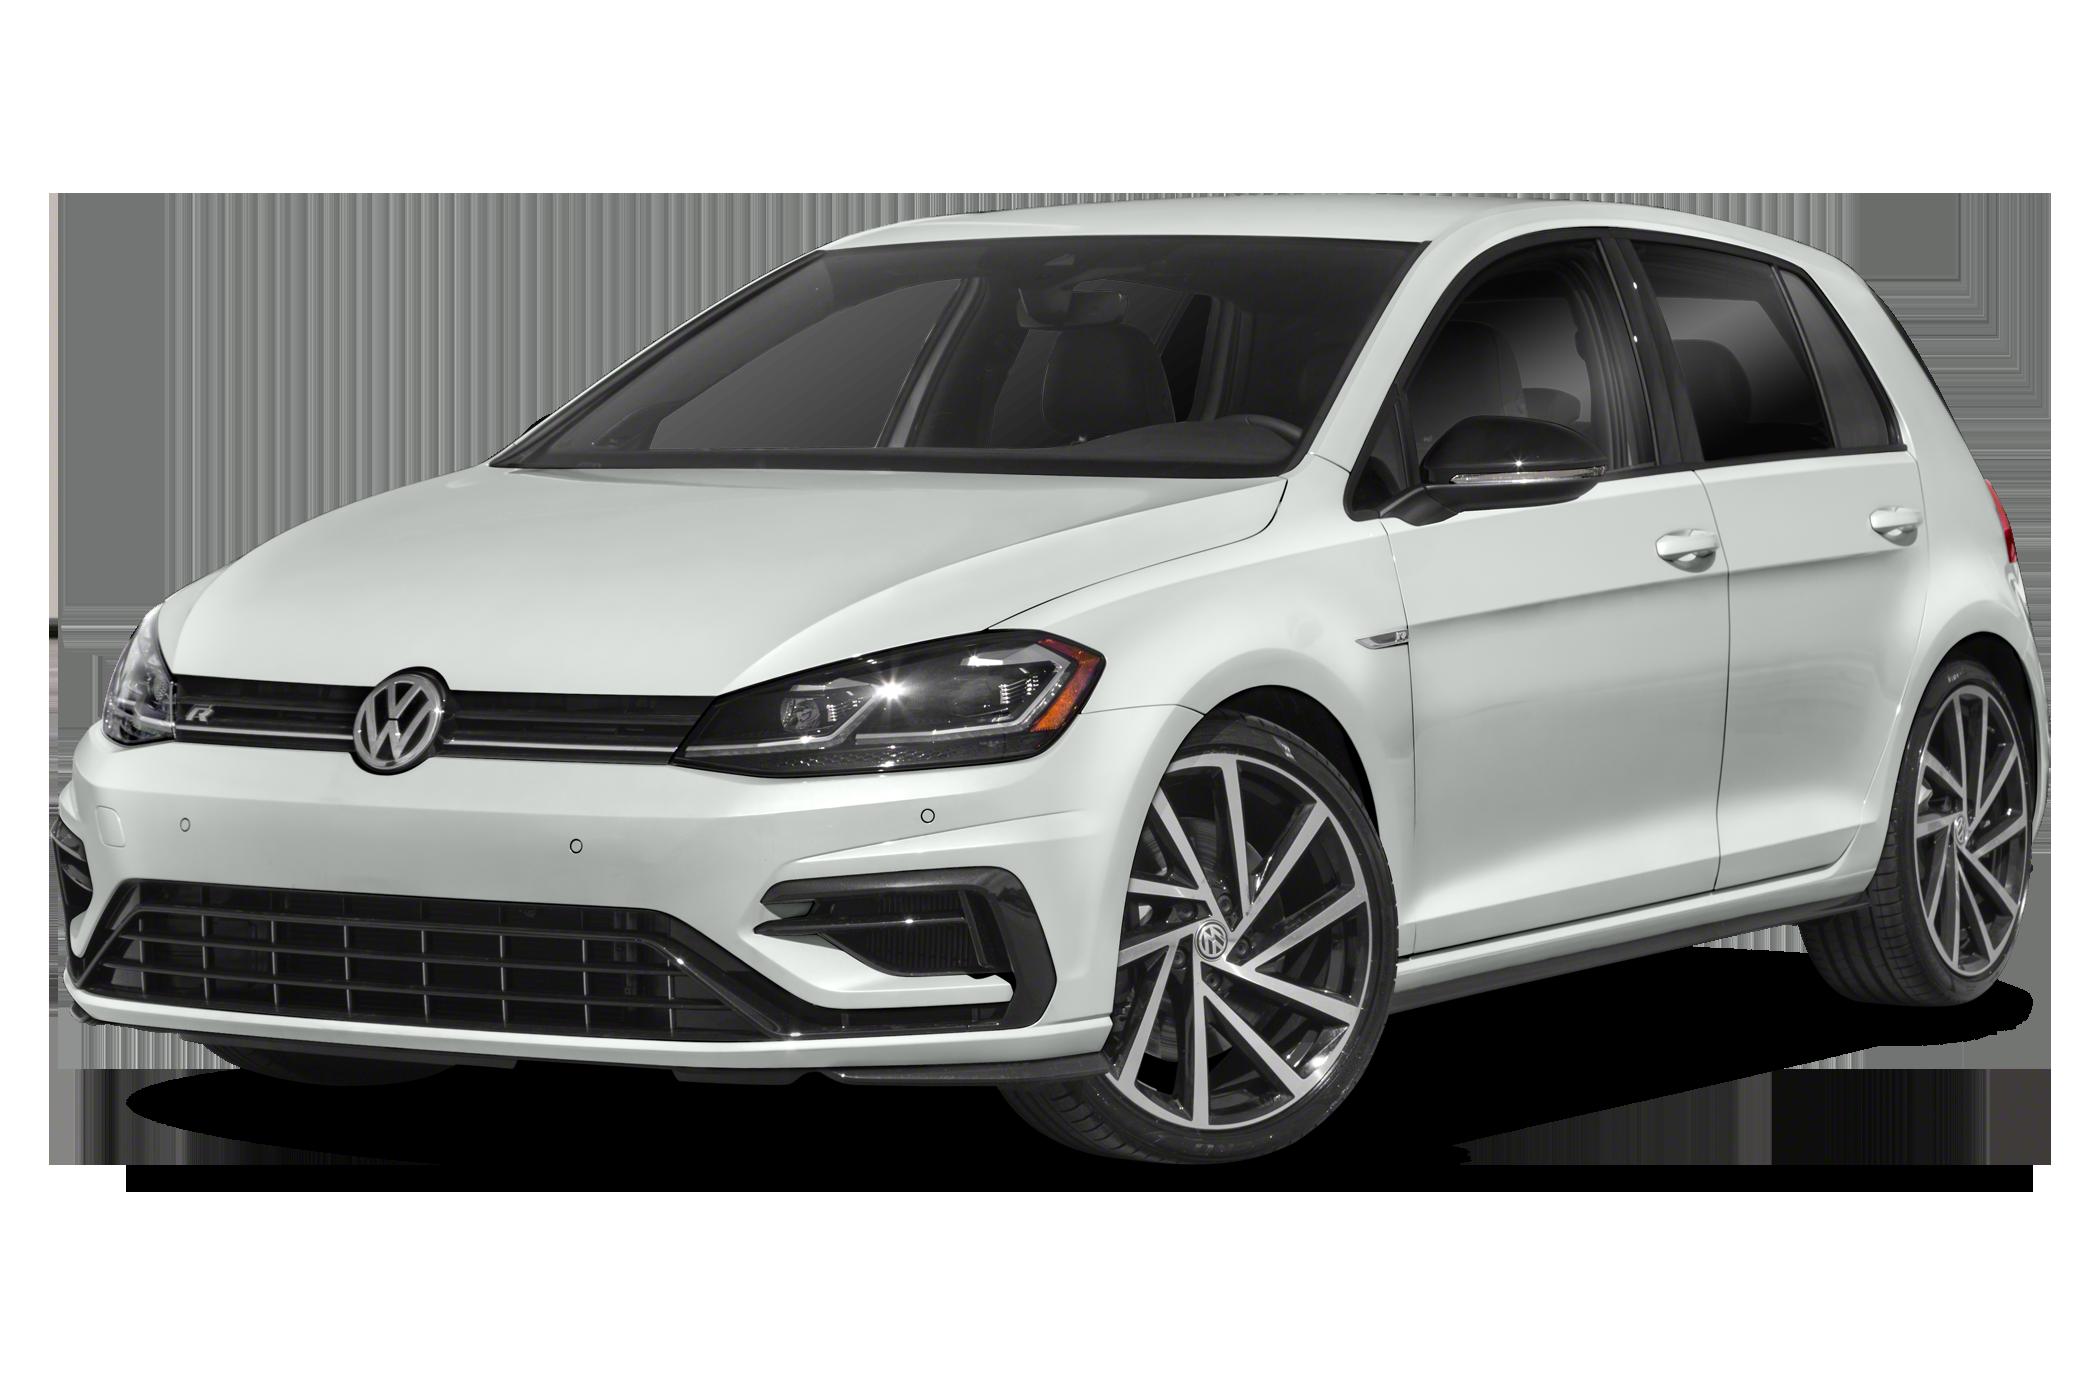 2019 Volkswagen Golf R - View Specs, Prices & Photos ...